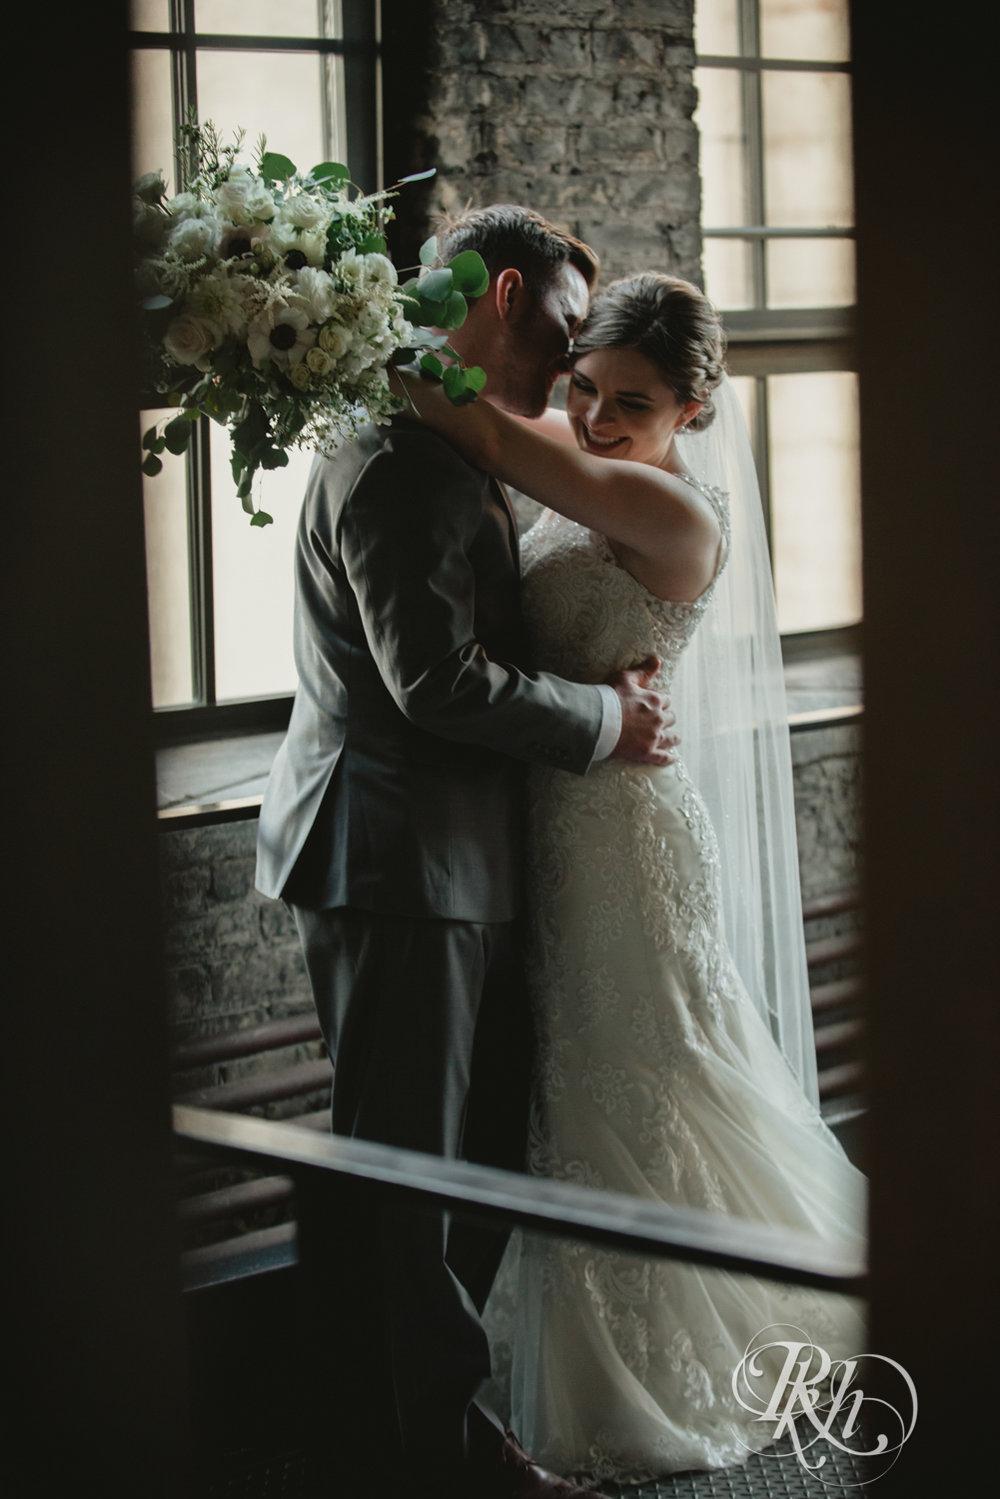 Lauren & Matt - Minnesota Wedding Photography - Mill City Museum - RKH Images - Blog (44 of 55).jpg